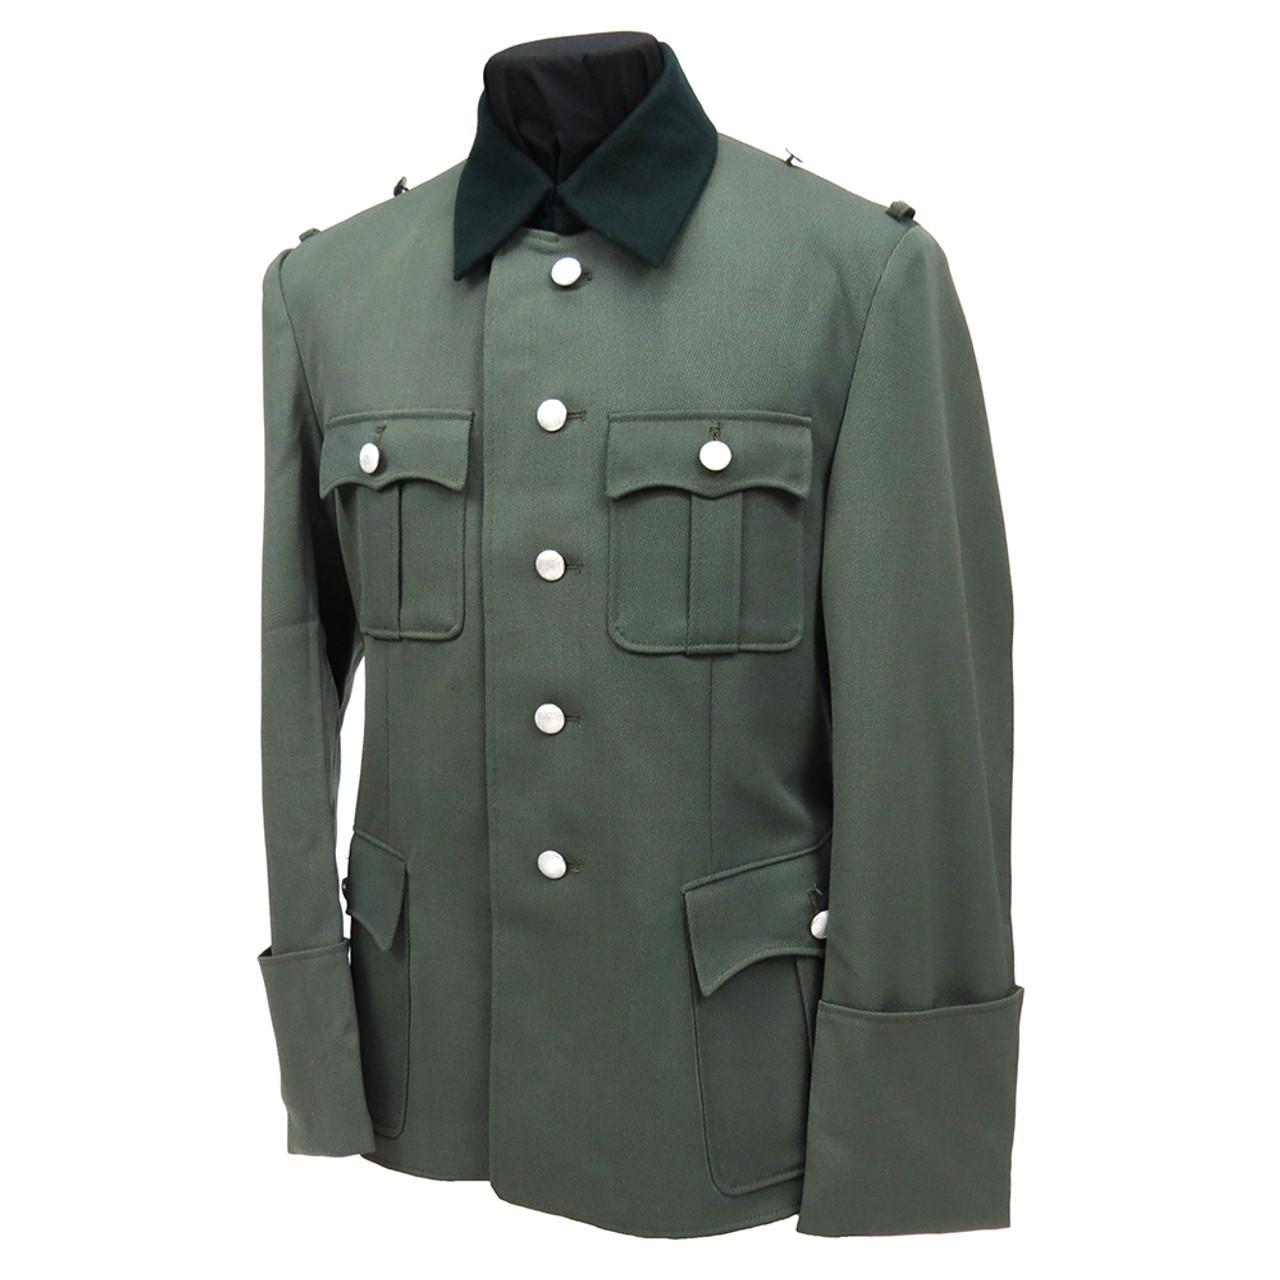 SS German Officer Dress Tunic in Gabardine Twill from Hessen Antique